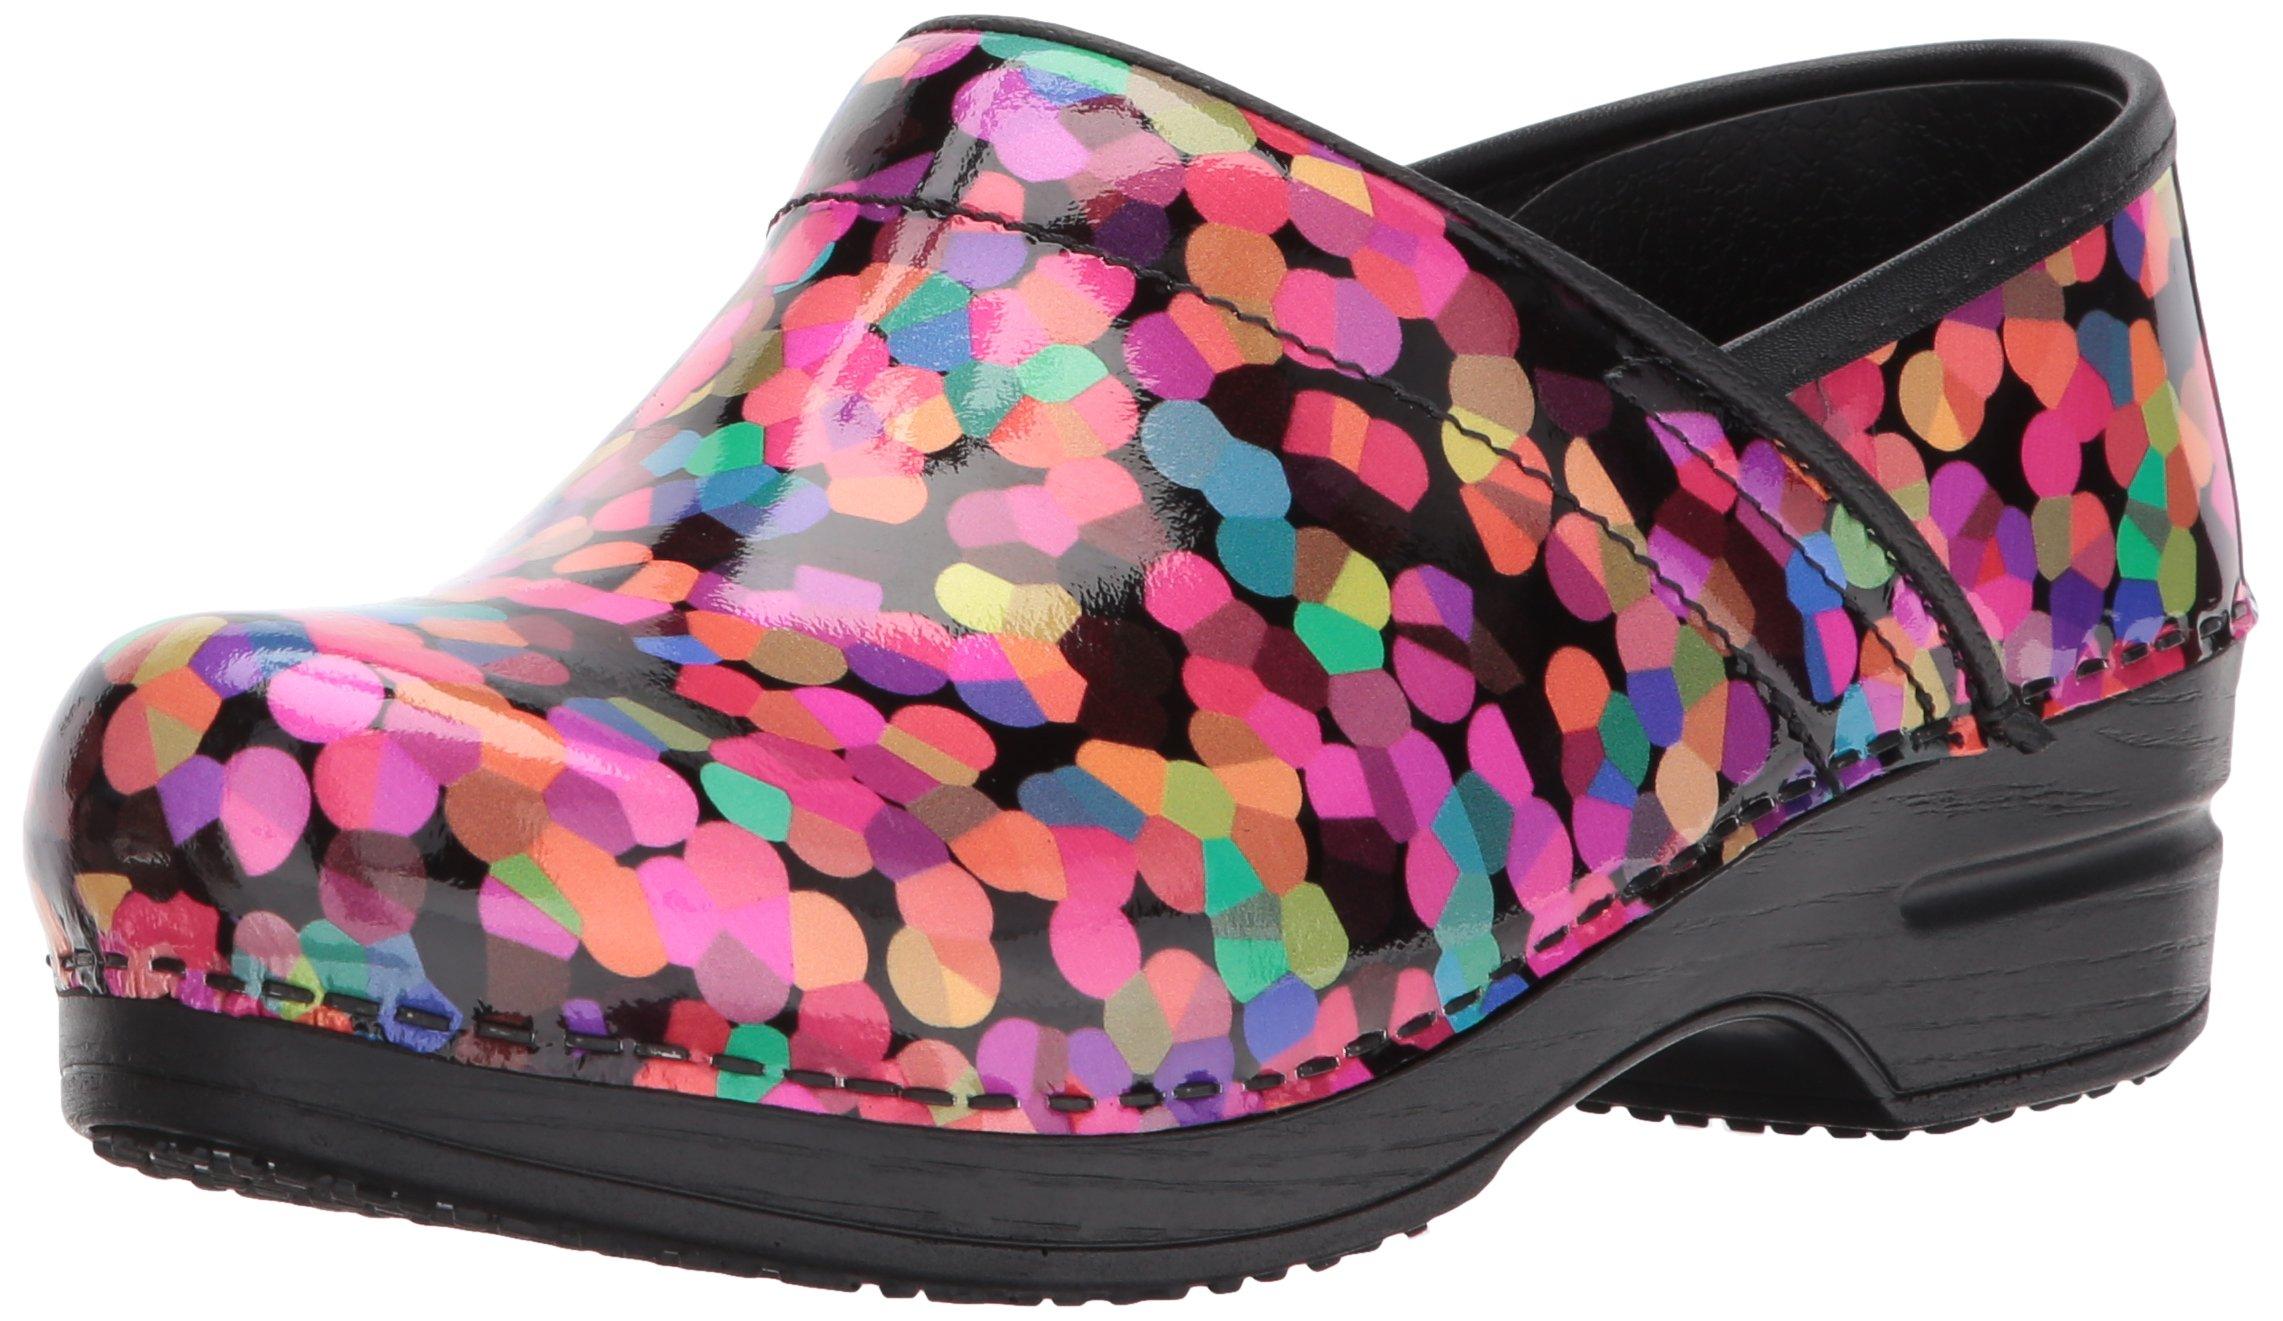 Sanita Women's Smart Step Scarlette Work Shoe, Multicolor, 39 EU/8/8.5 M US